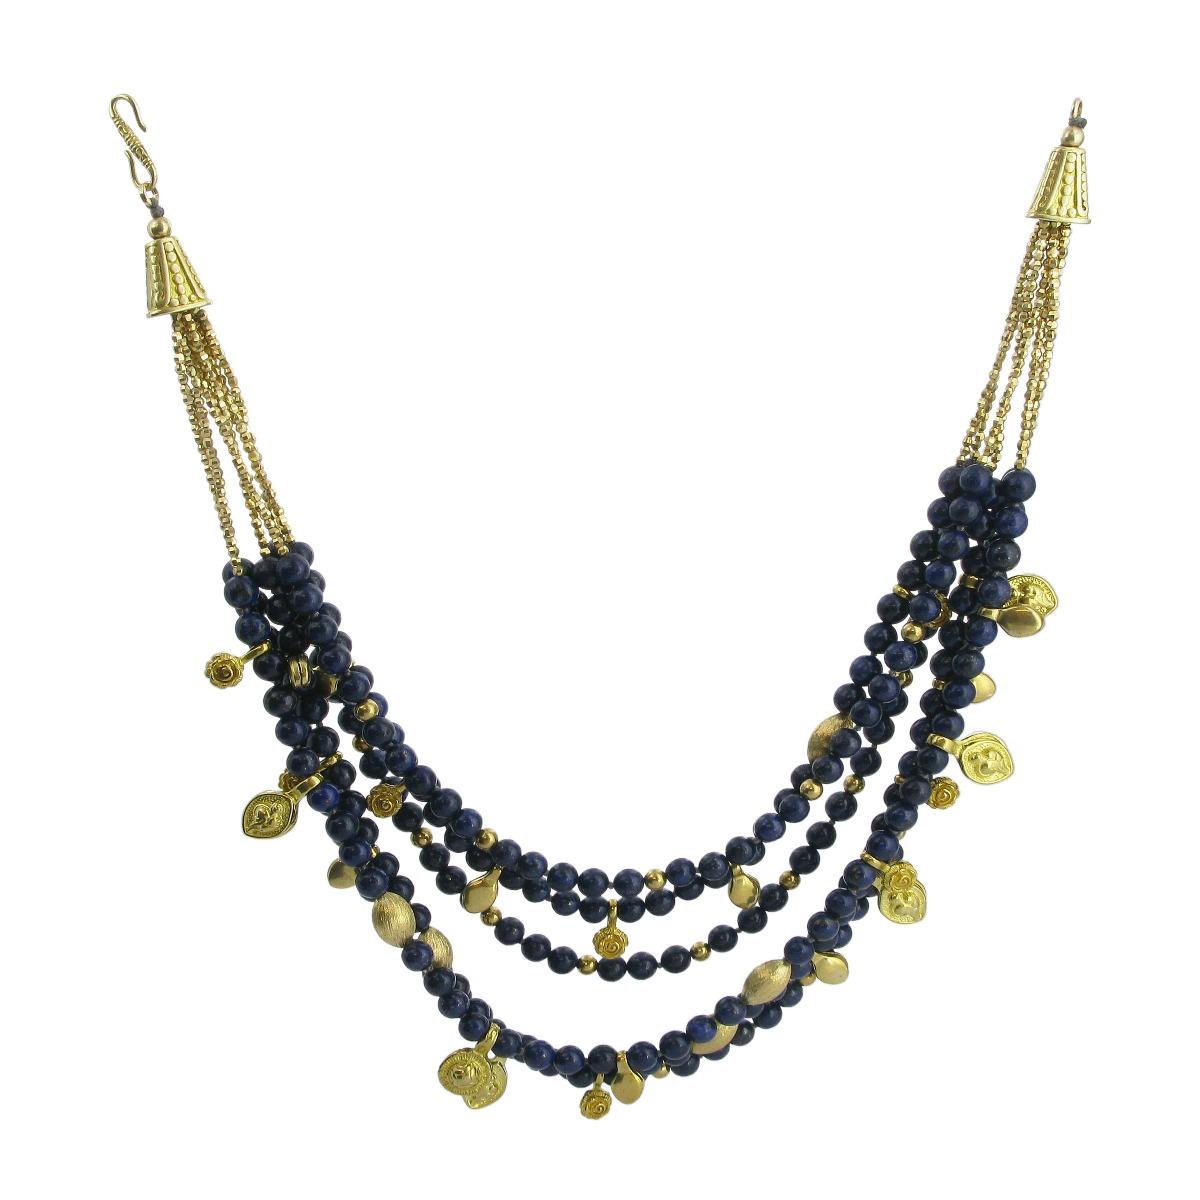 Lapis lazuli 6 strand necklace